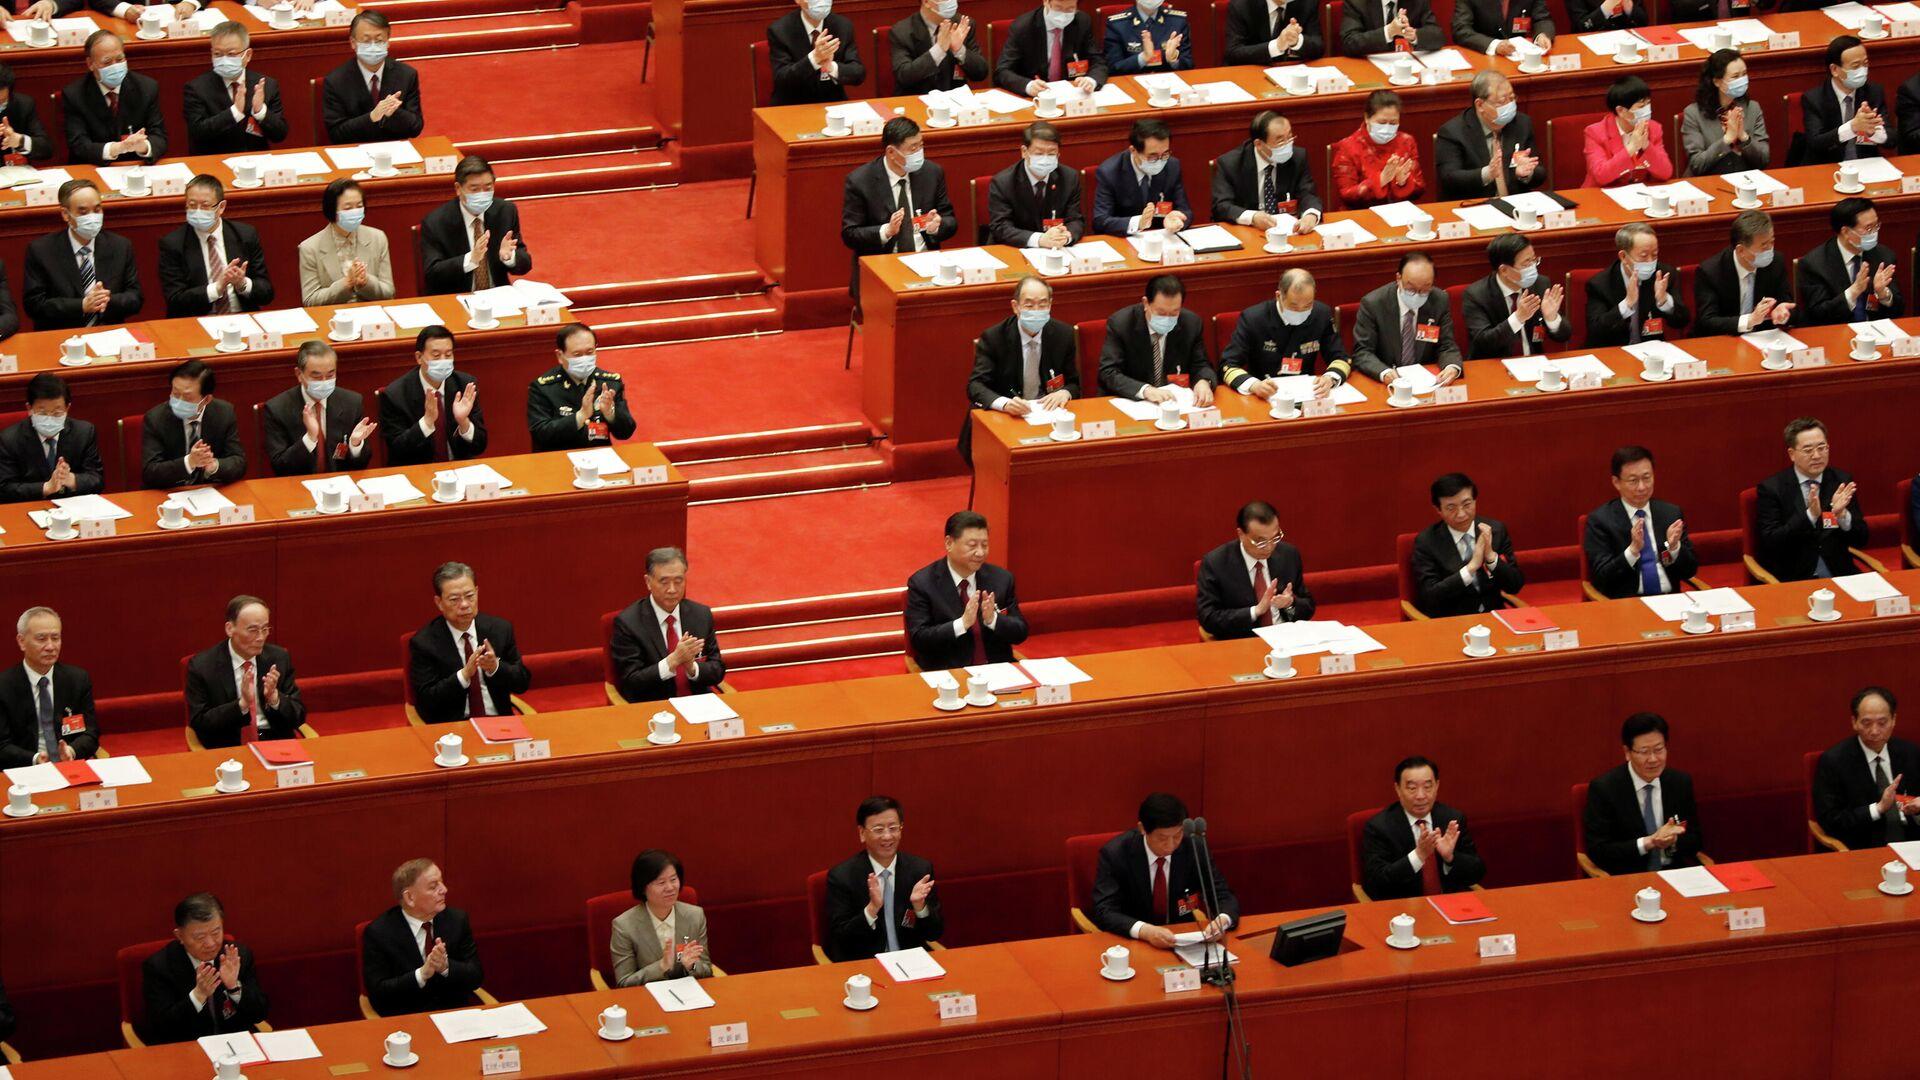 Una sesión de Asamblea Popular Nacional de China - Sputnik Mundo, 1920, 11.03.2021